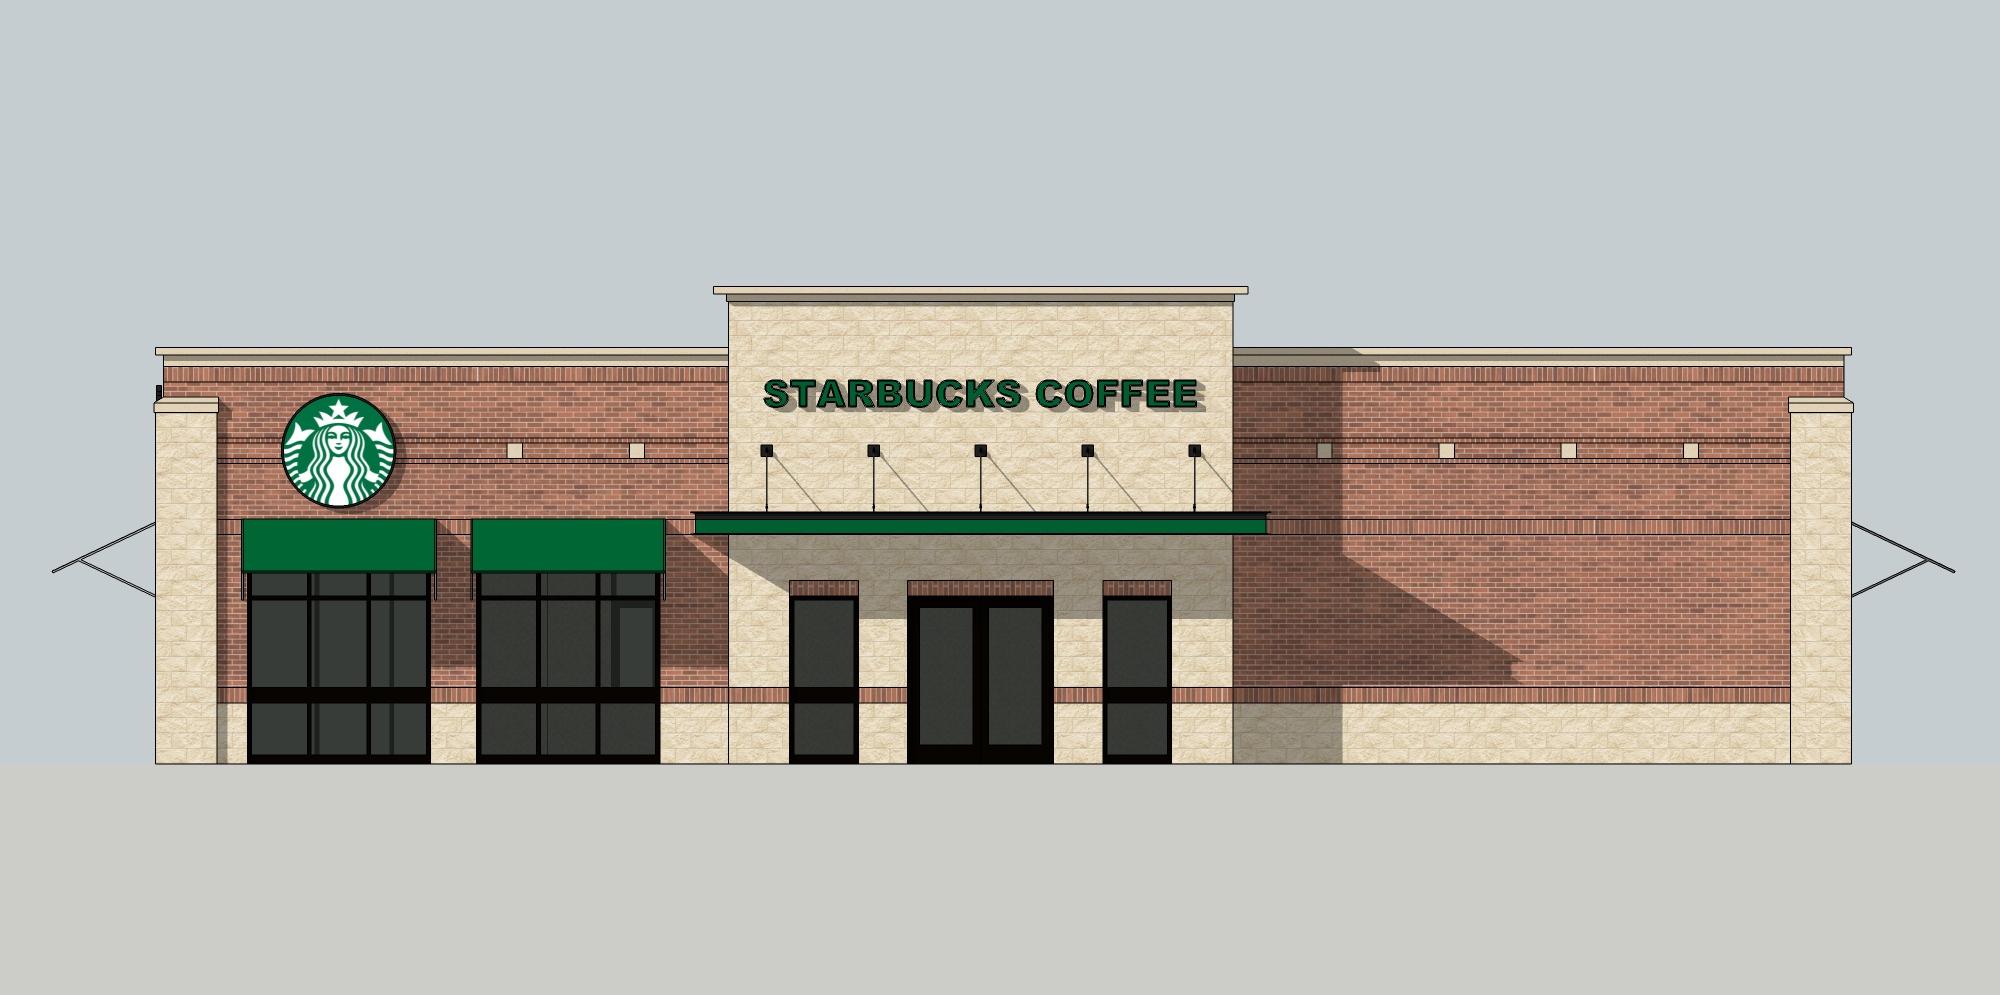 2016_04-07 Starbucks Hampton_Material Opt1_Alt1.3.jpg